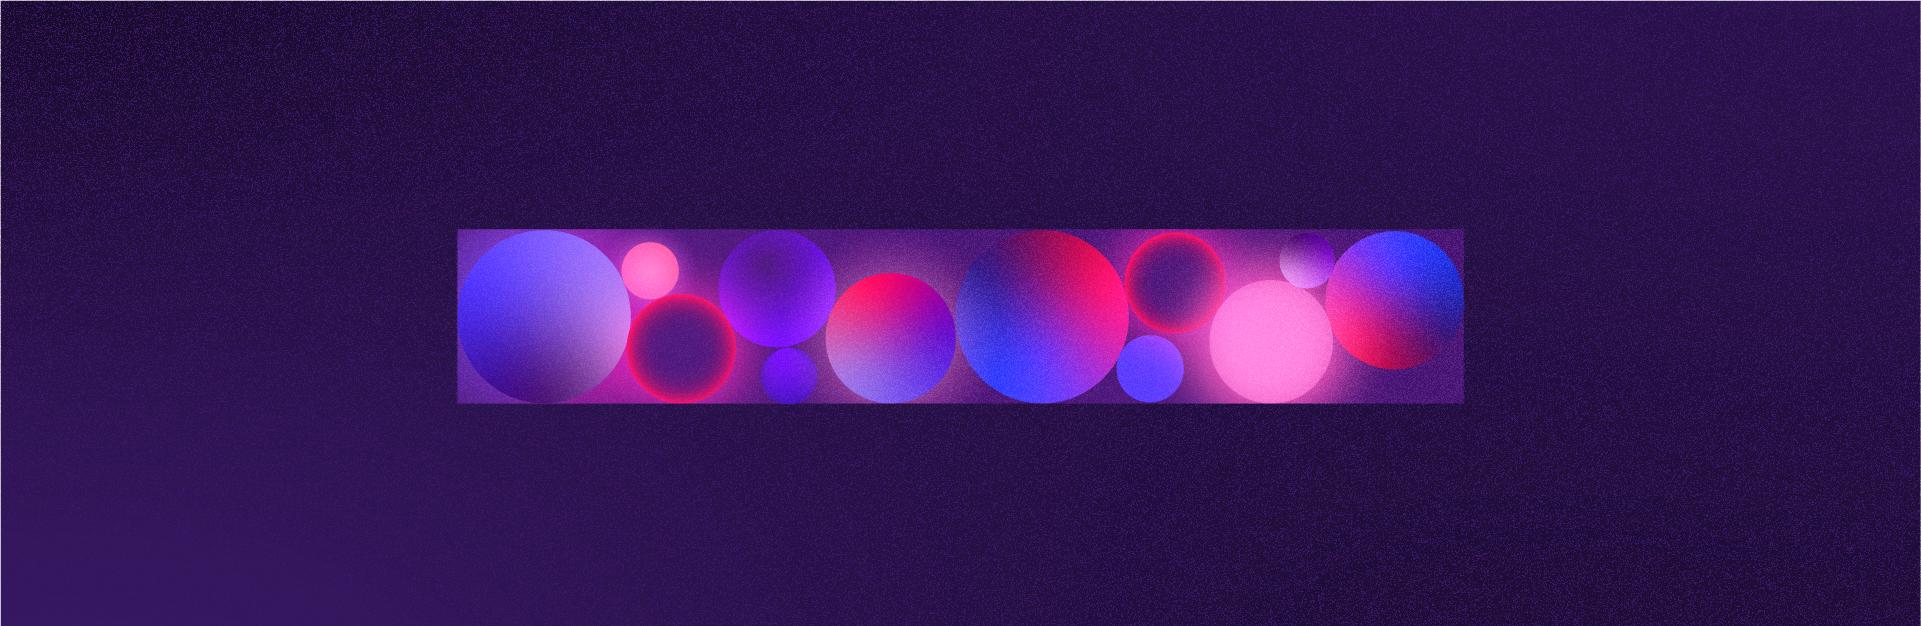 Enel-X_PP_ColorBoard_V01-12